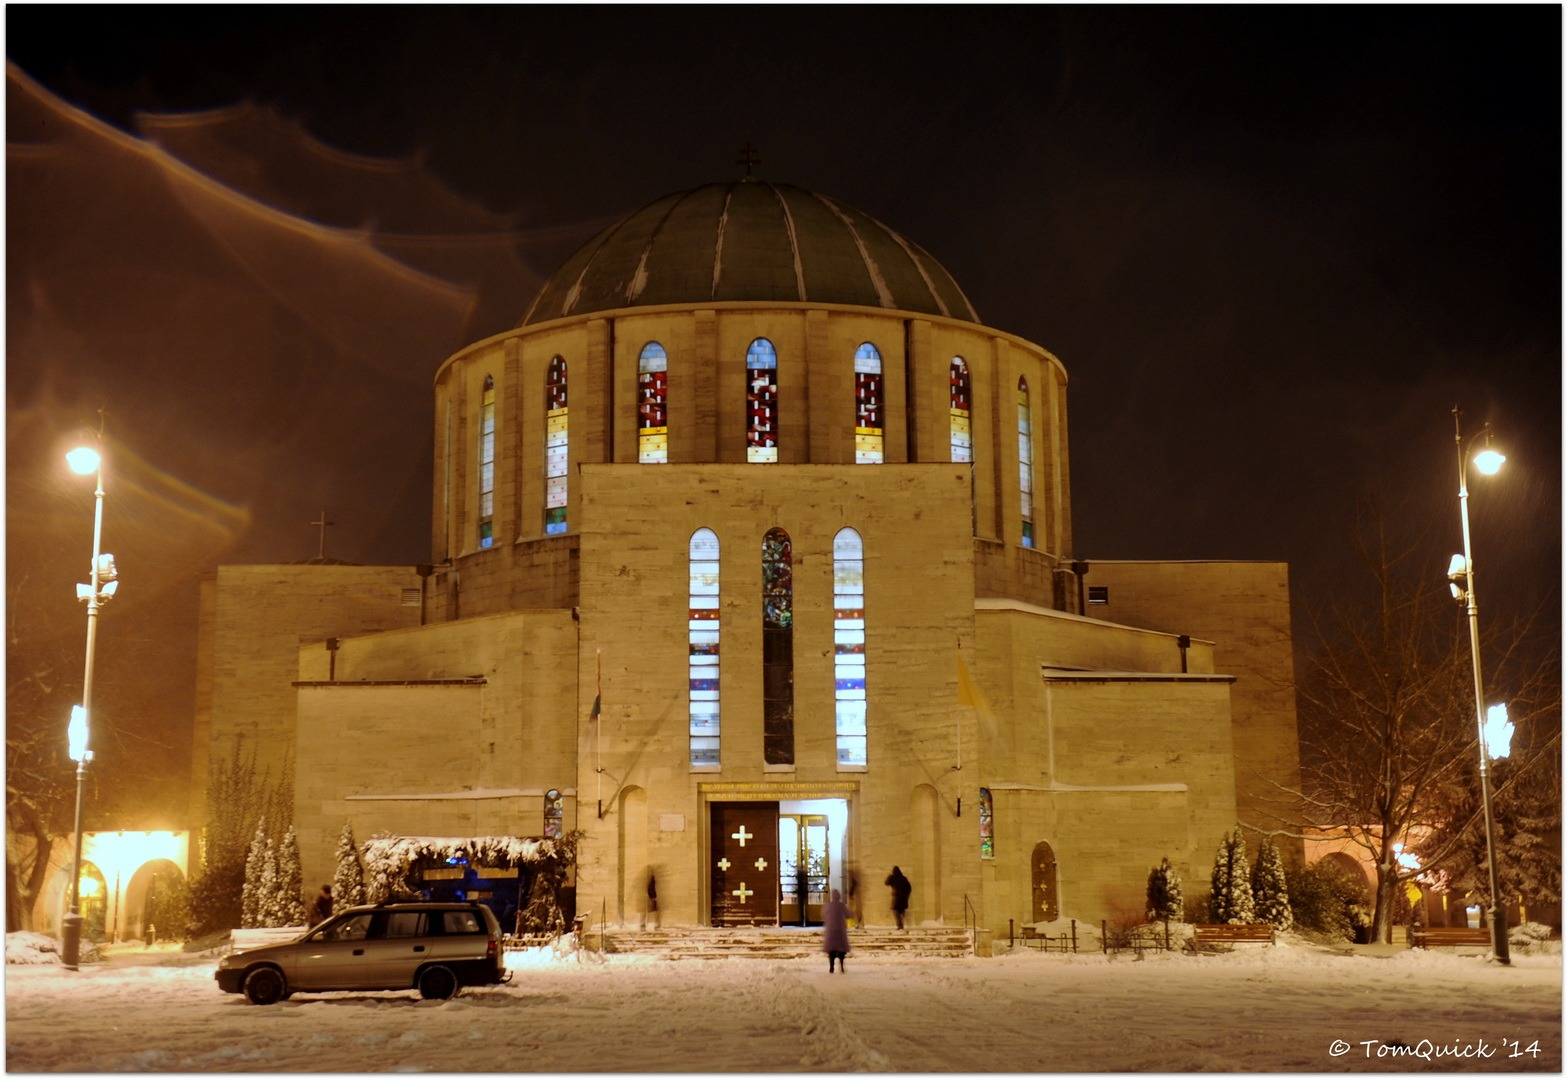 Fogadalmi templom